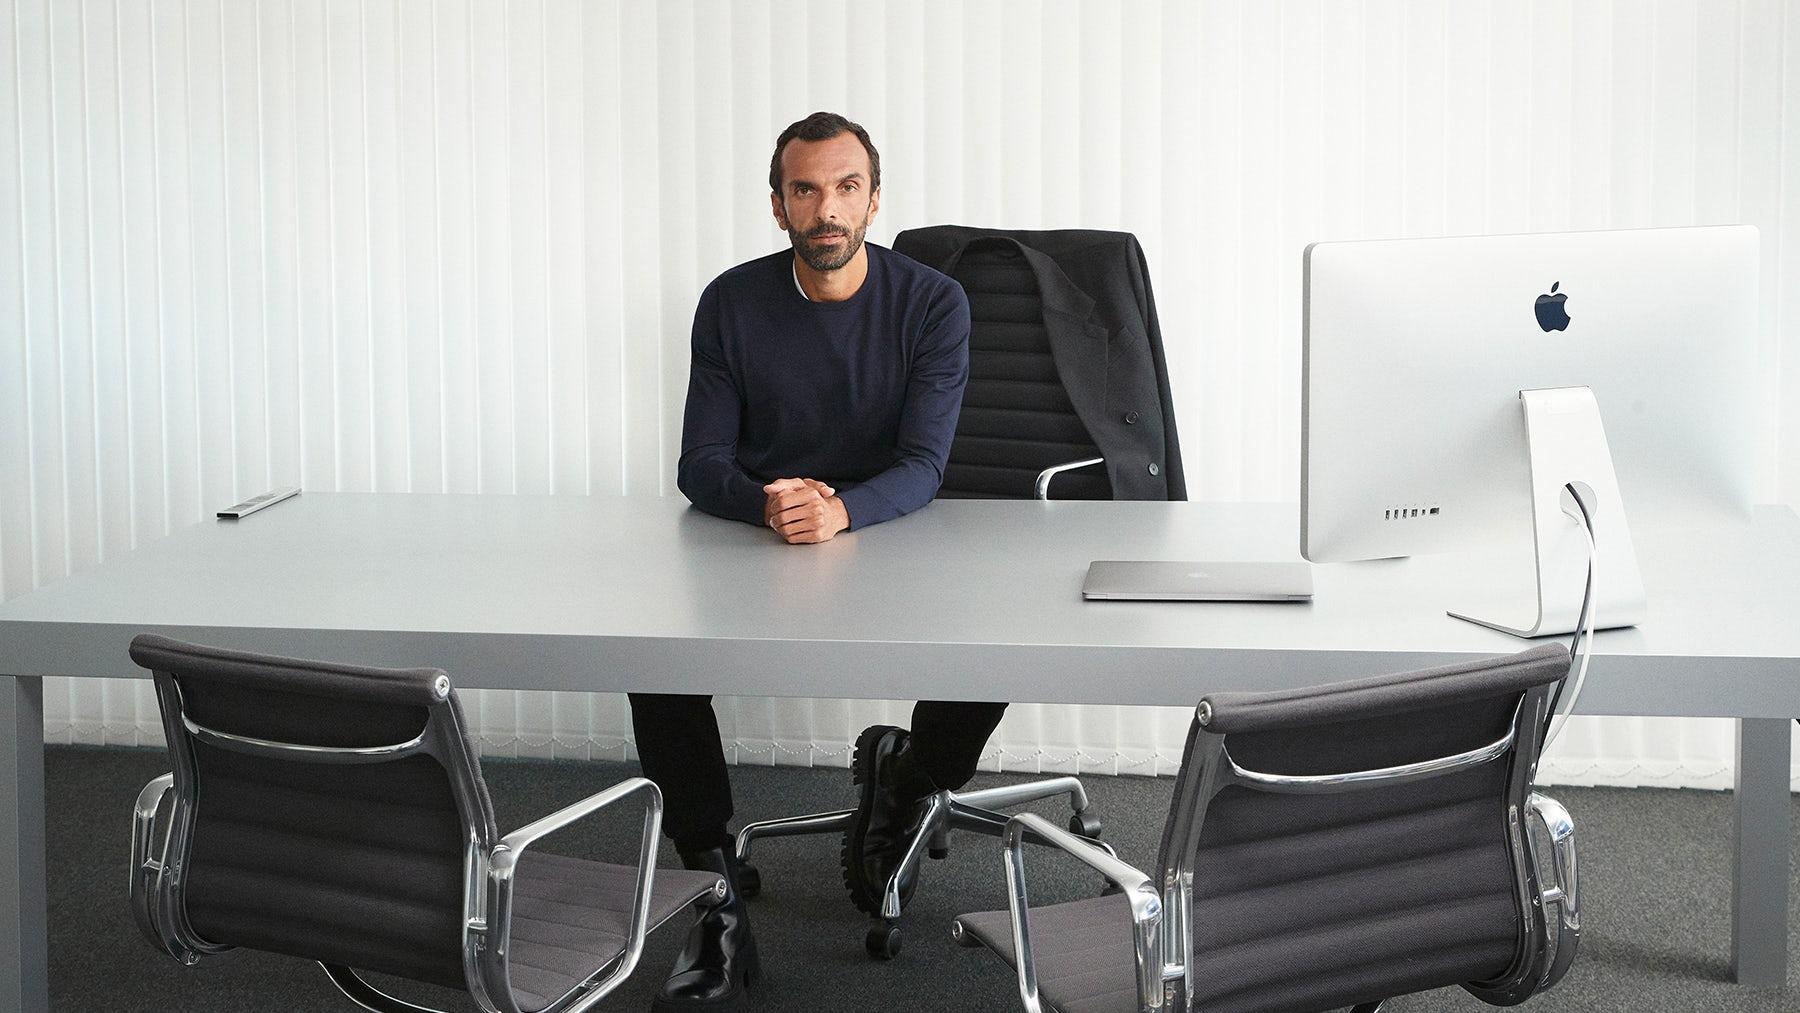 Balenciaga chief executive, Cédric Charbit. Thomas Lohr for BoF.